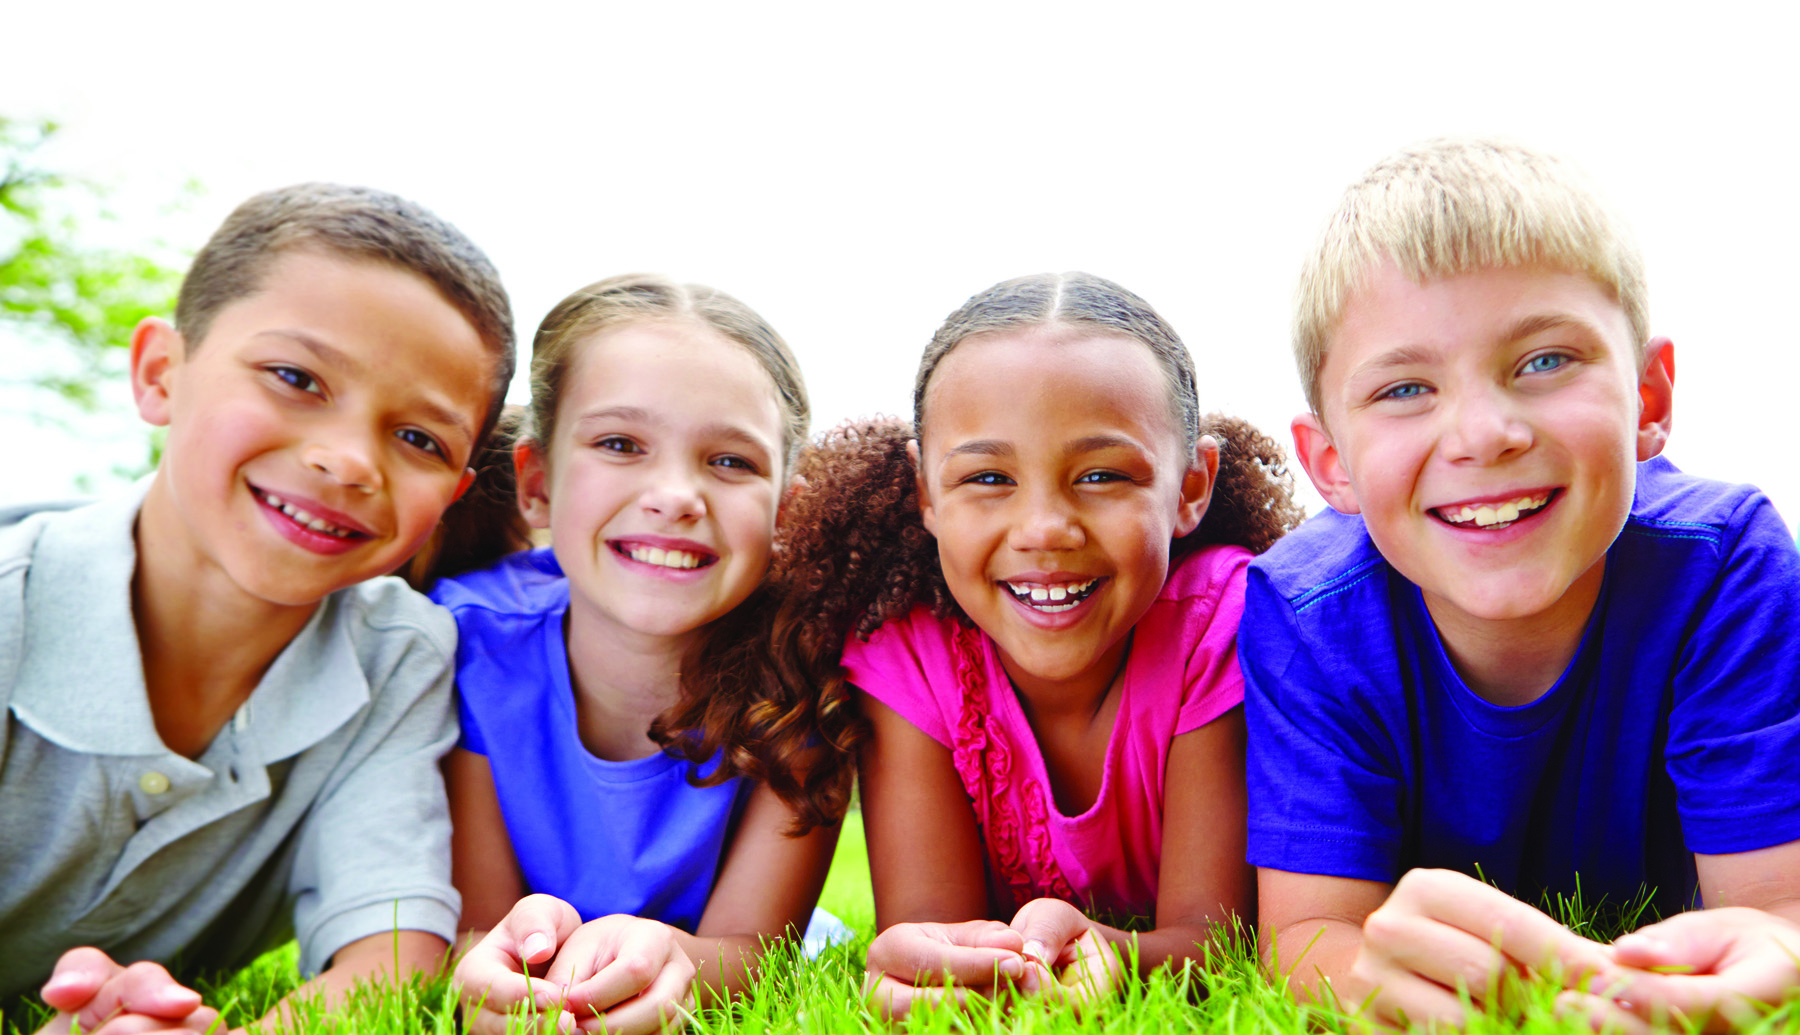 KidsGrass-Campaign.jpg